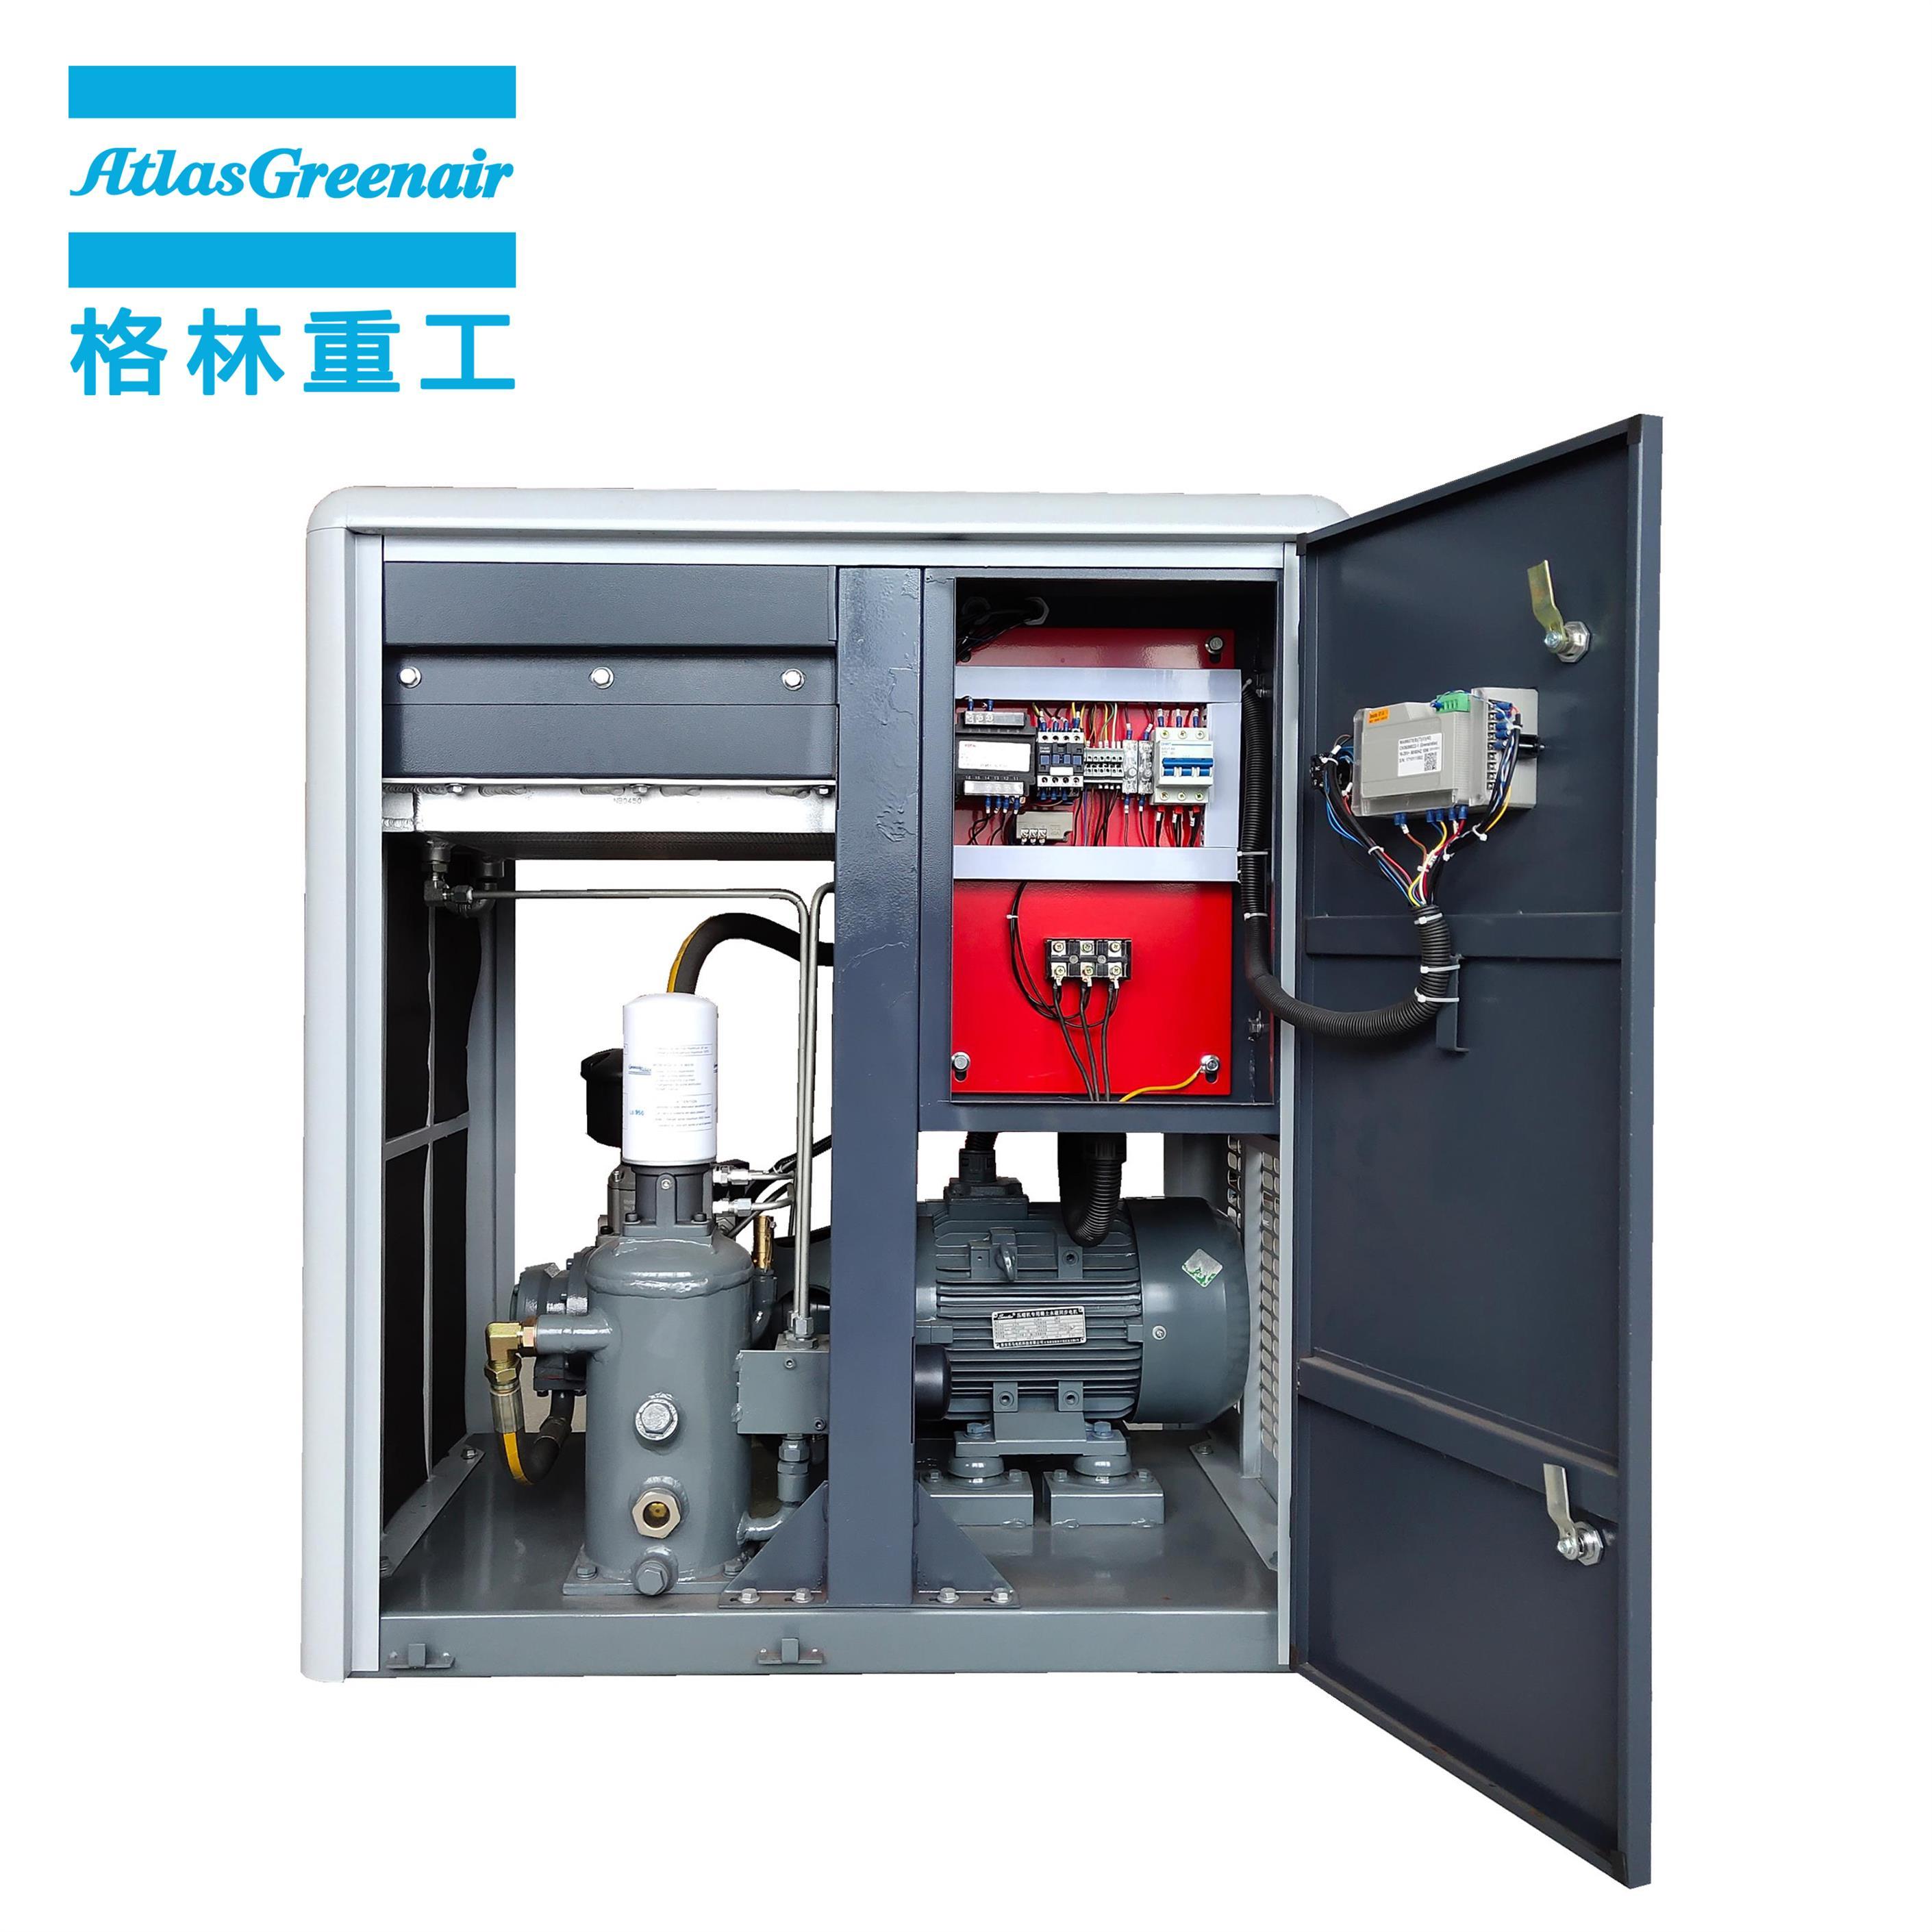 cheap vsd compressor atlas copco factory customization-2